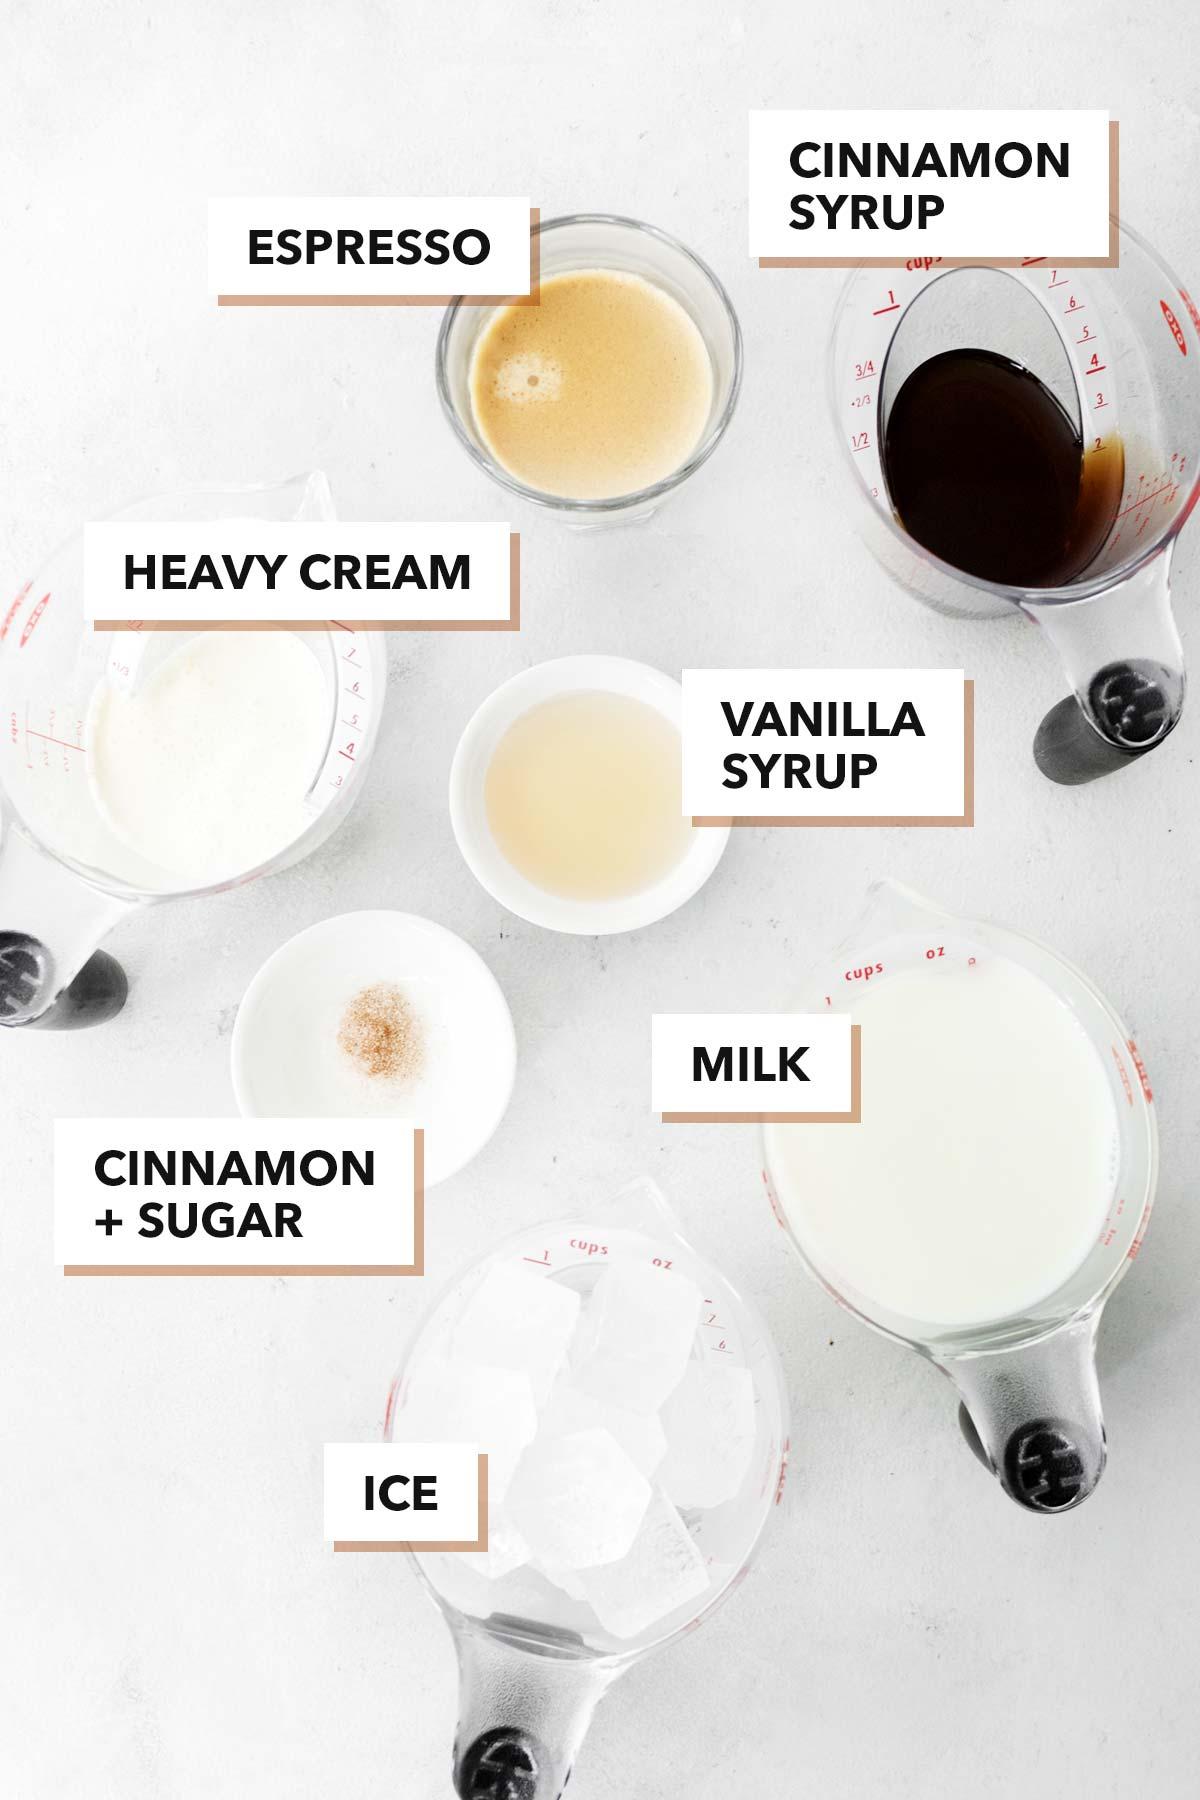 Starbucks Iced Cinnamon Dolce Latte copycat ingredients.